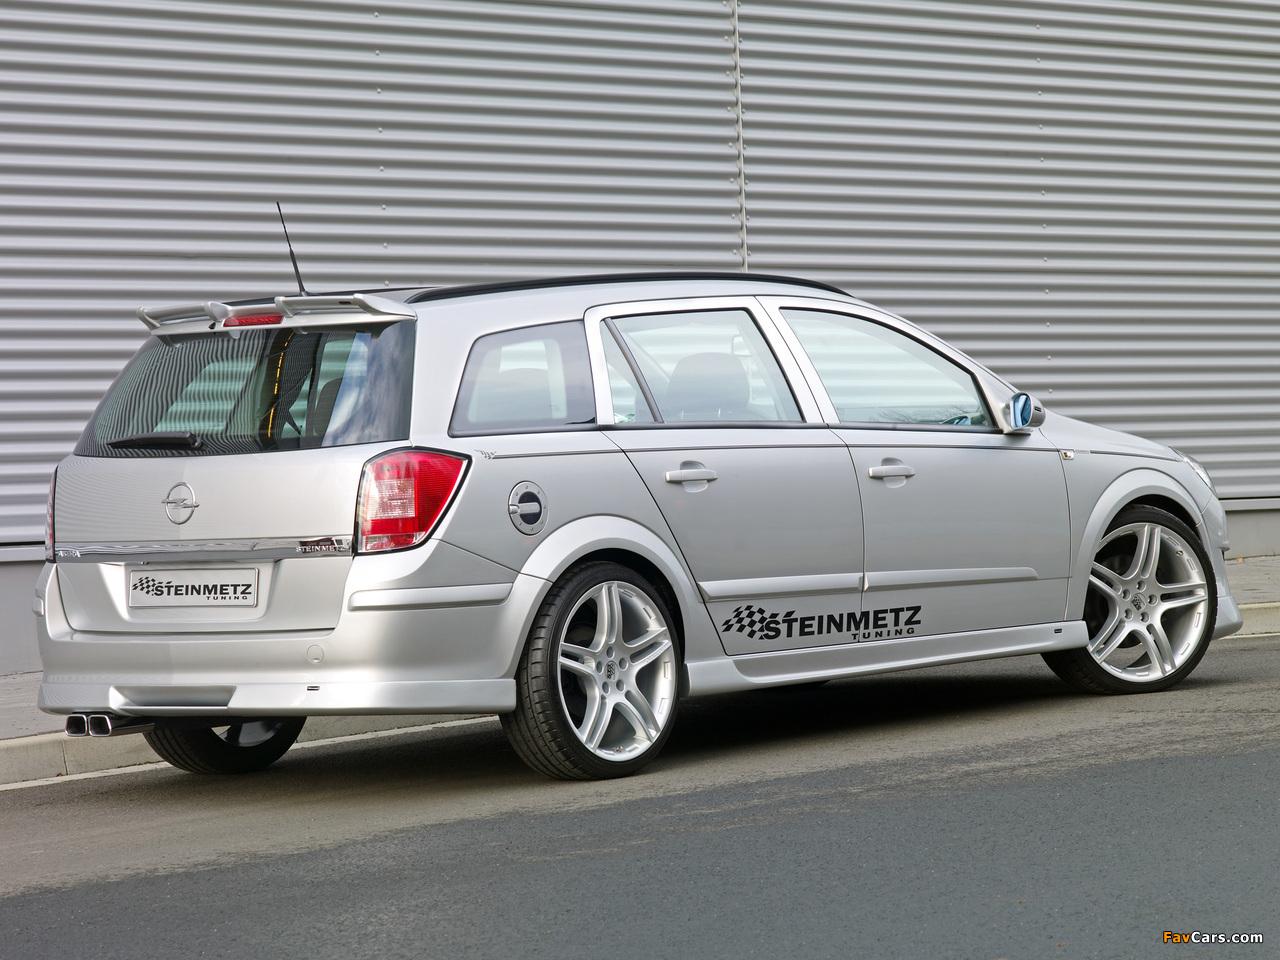 Steinmetz Opel Astra Caravan (H) 2007 photos (1280 x 960)